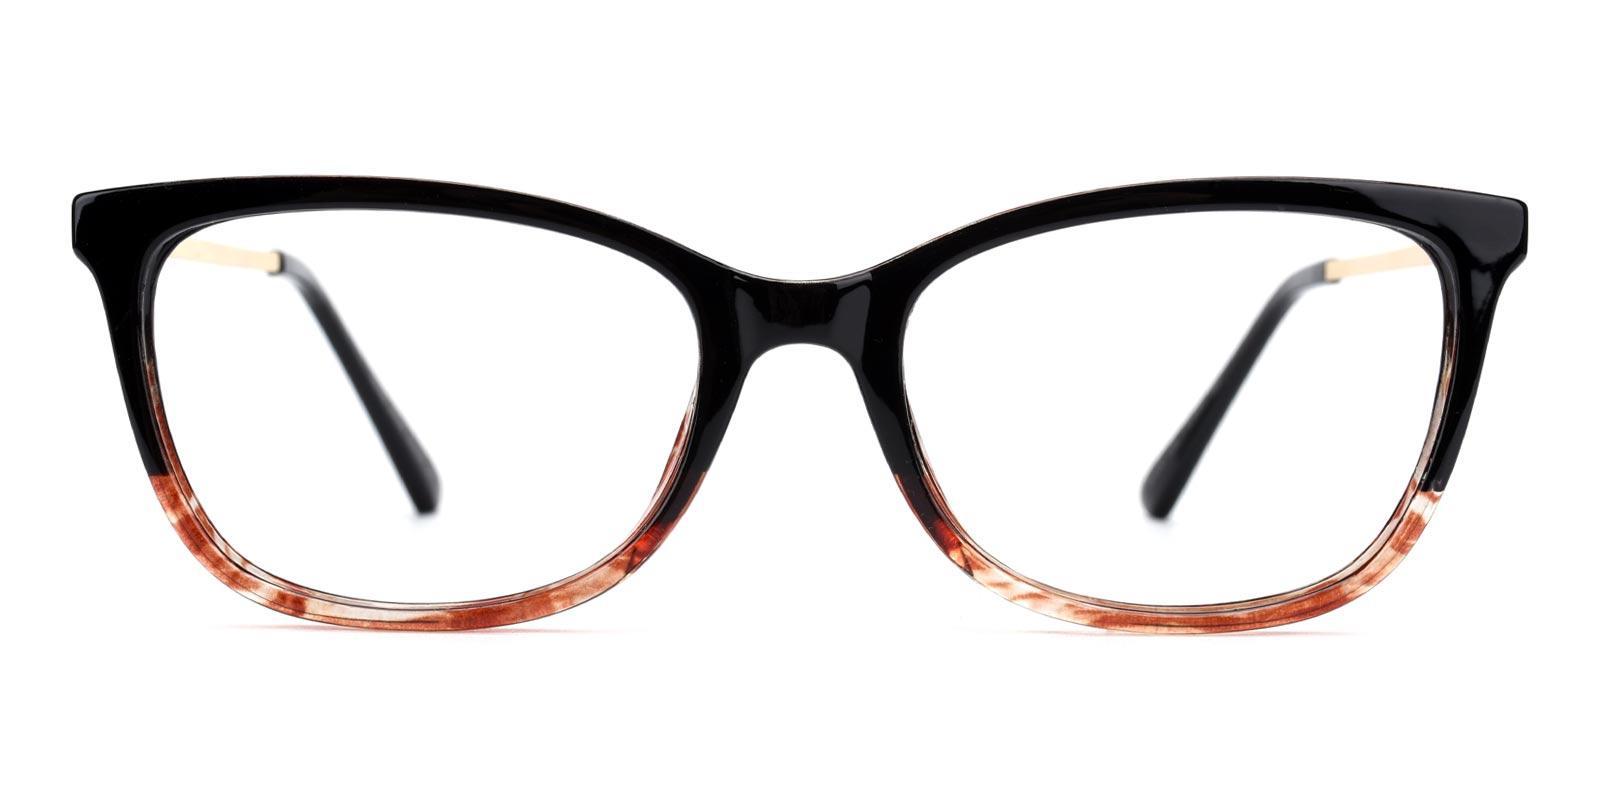 Monica-Tortoise-Rectangle-Acetate-Eyeglasses-additional2